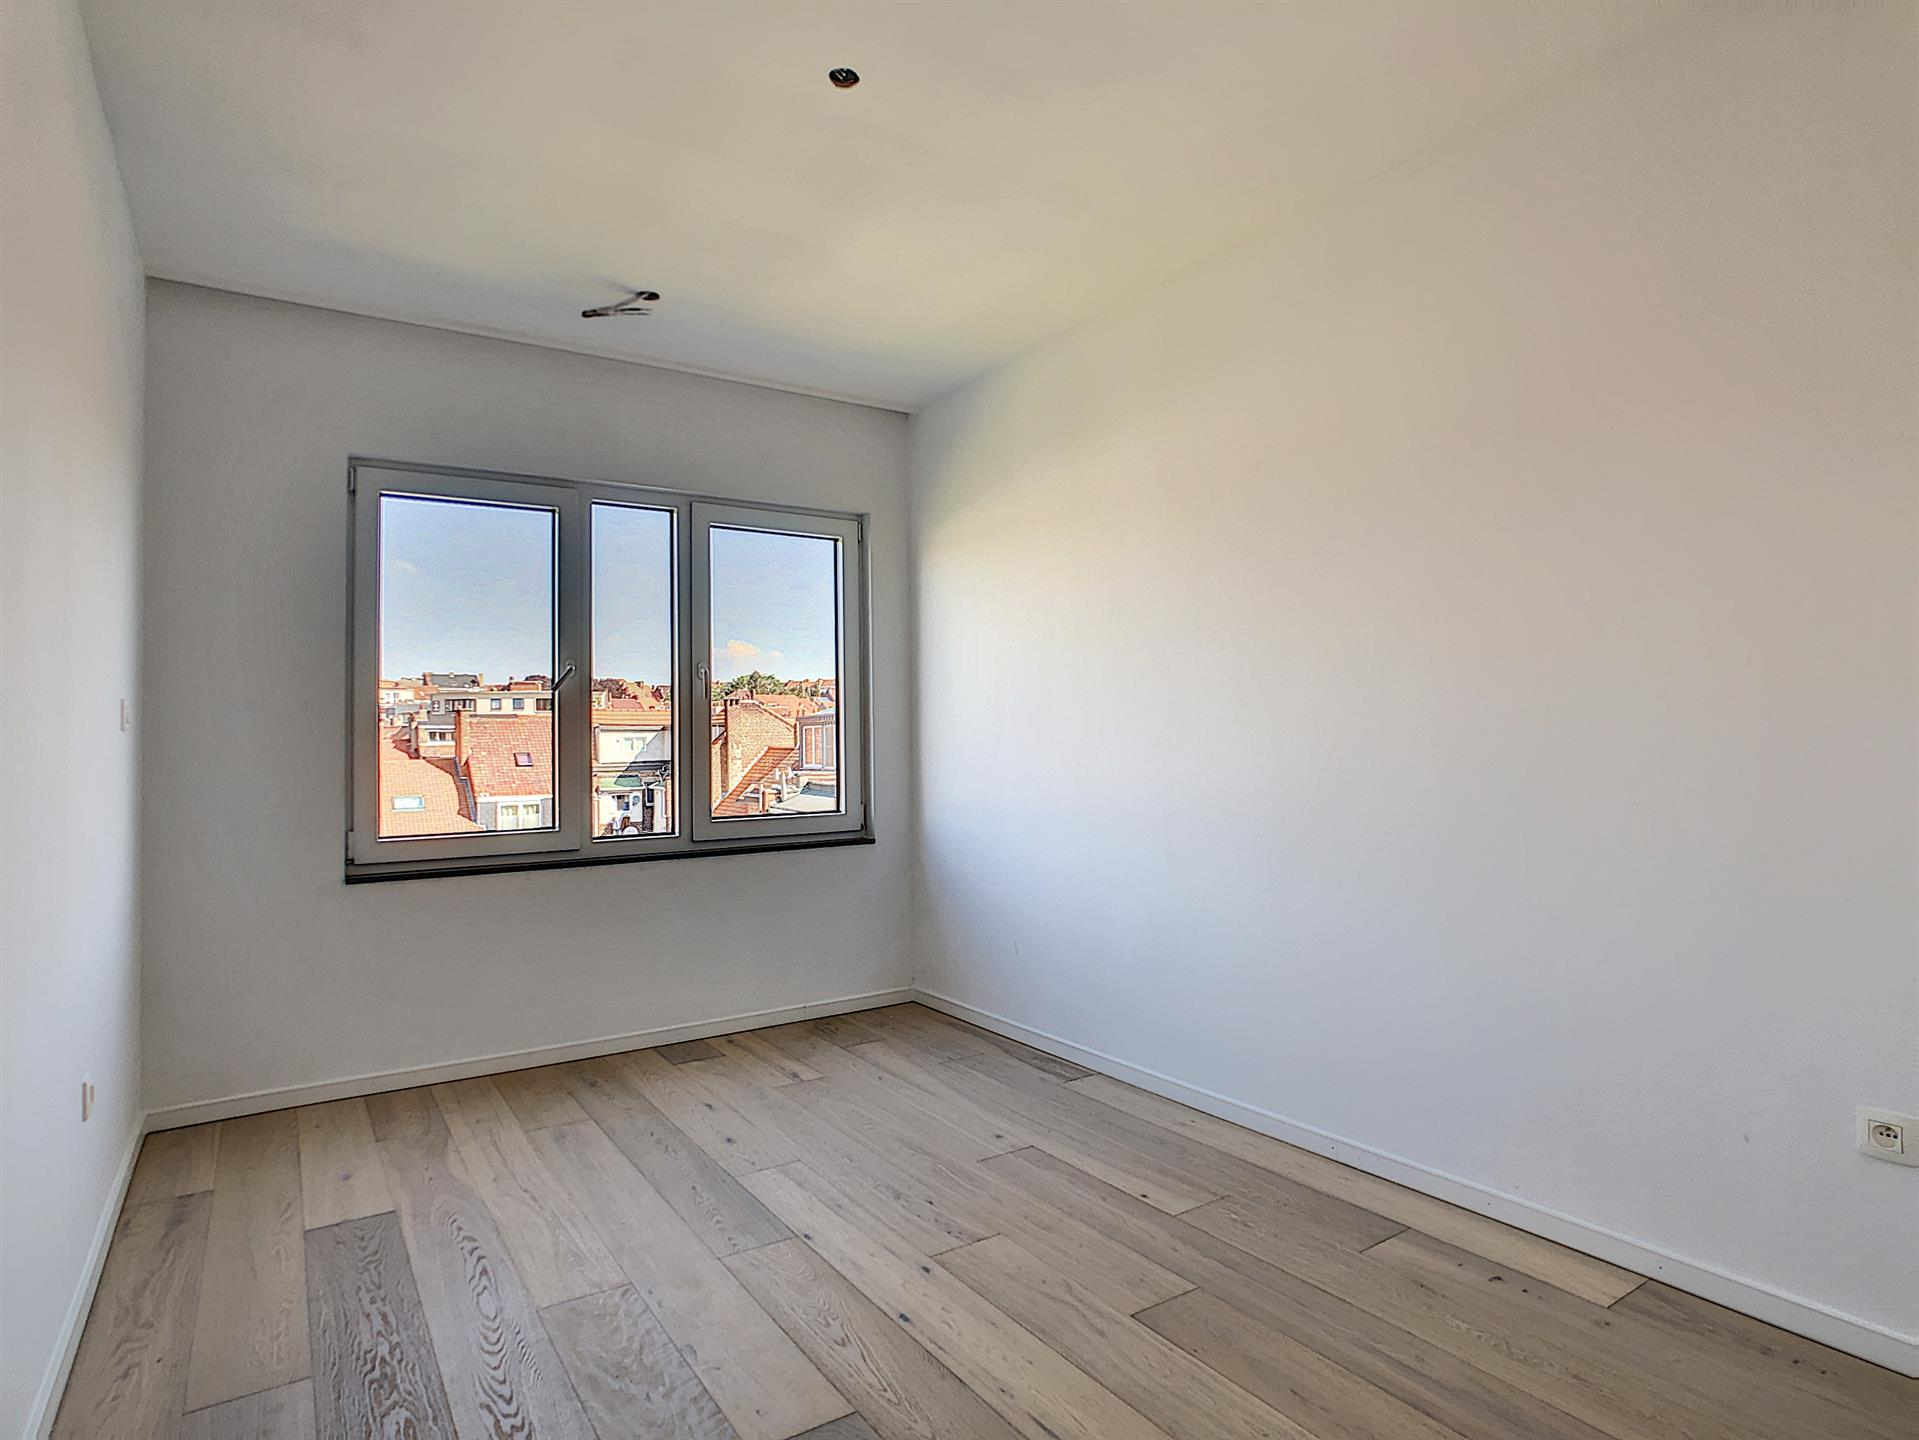 Appartement - Anderlecht - #4252375-14